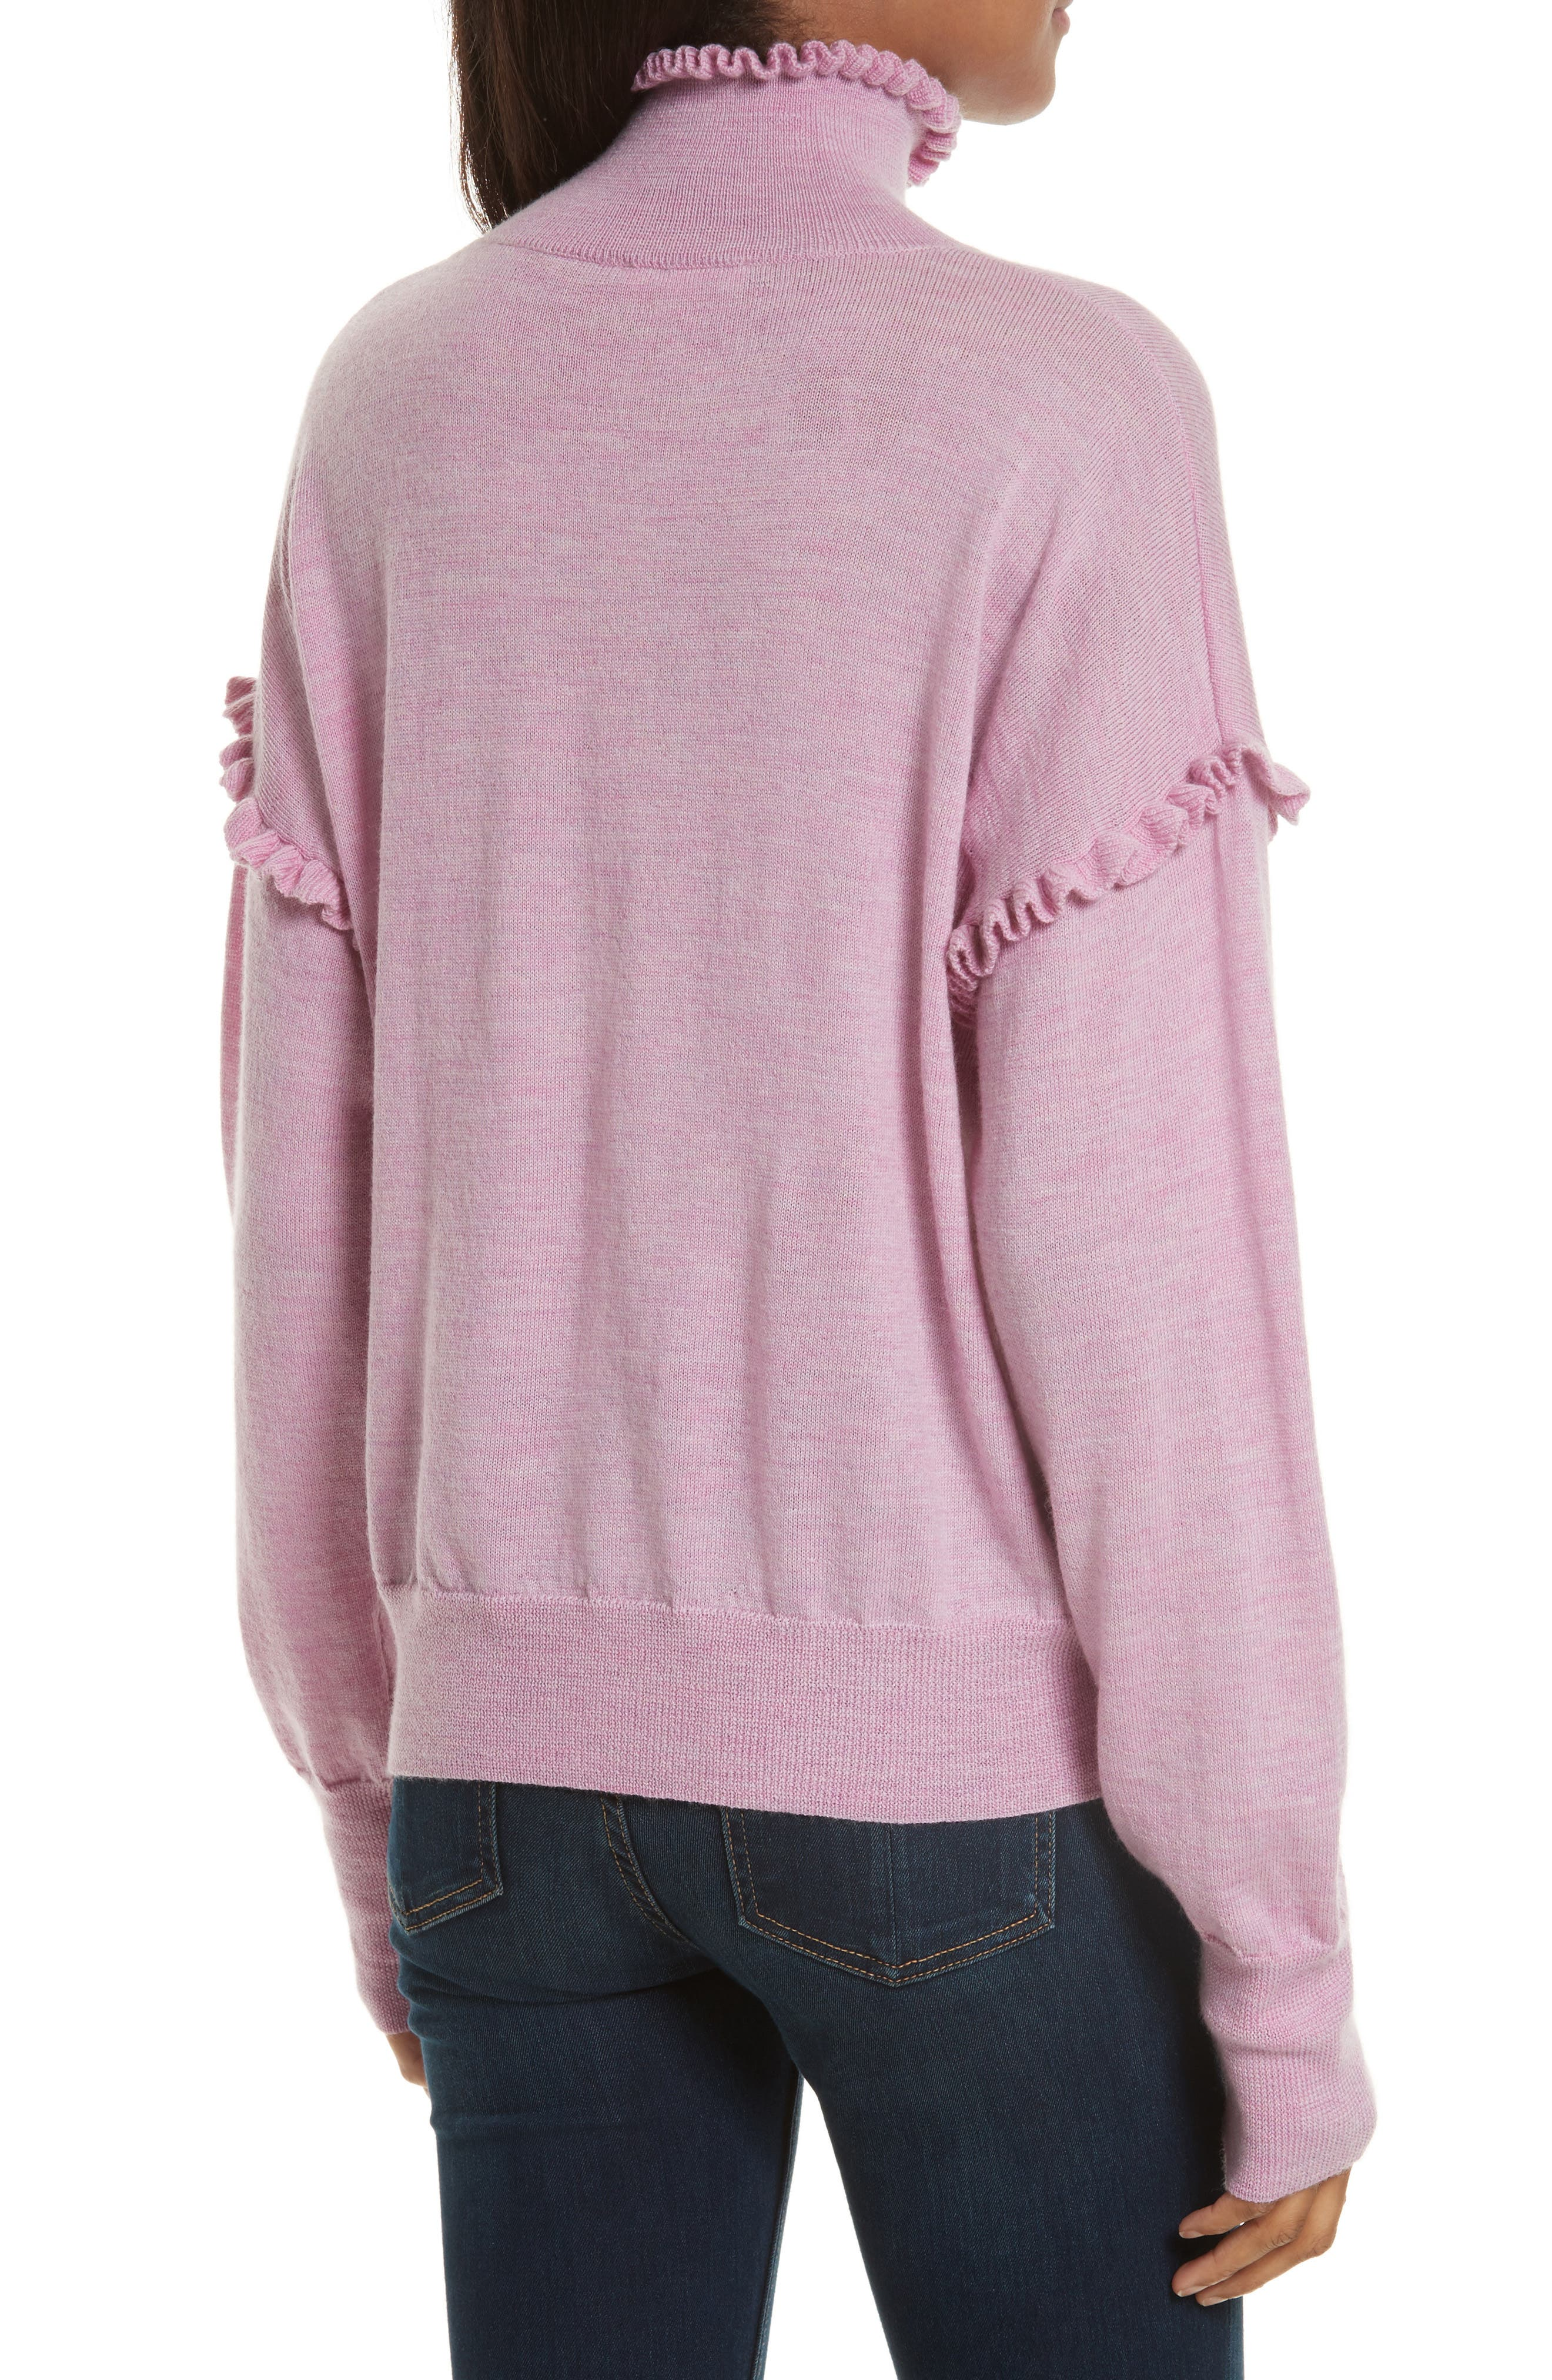 Turtleneck Merino Wool Sweater,                             Alternate thumbnail 2, color,                             691